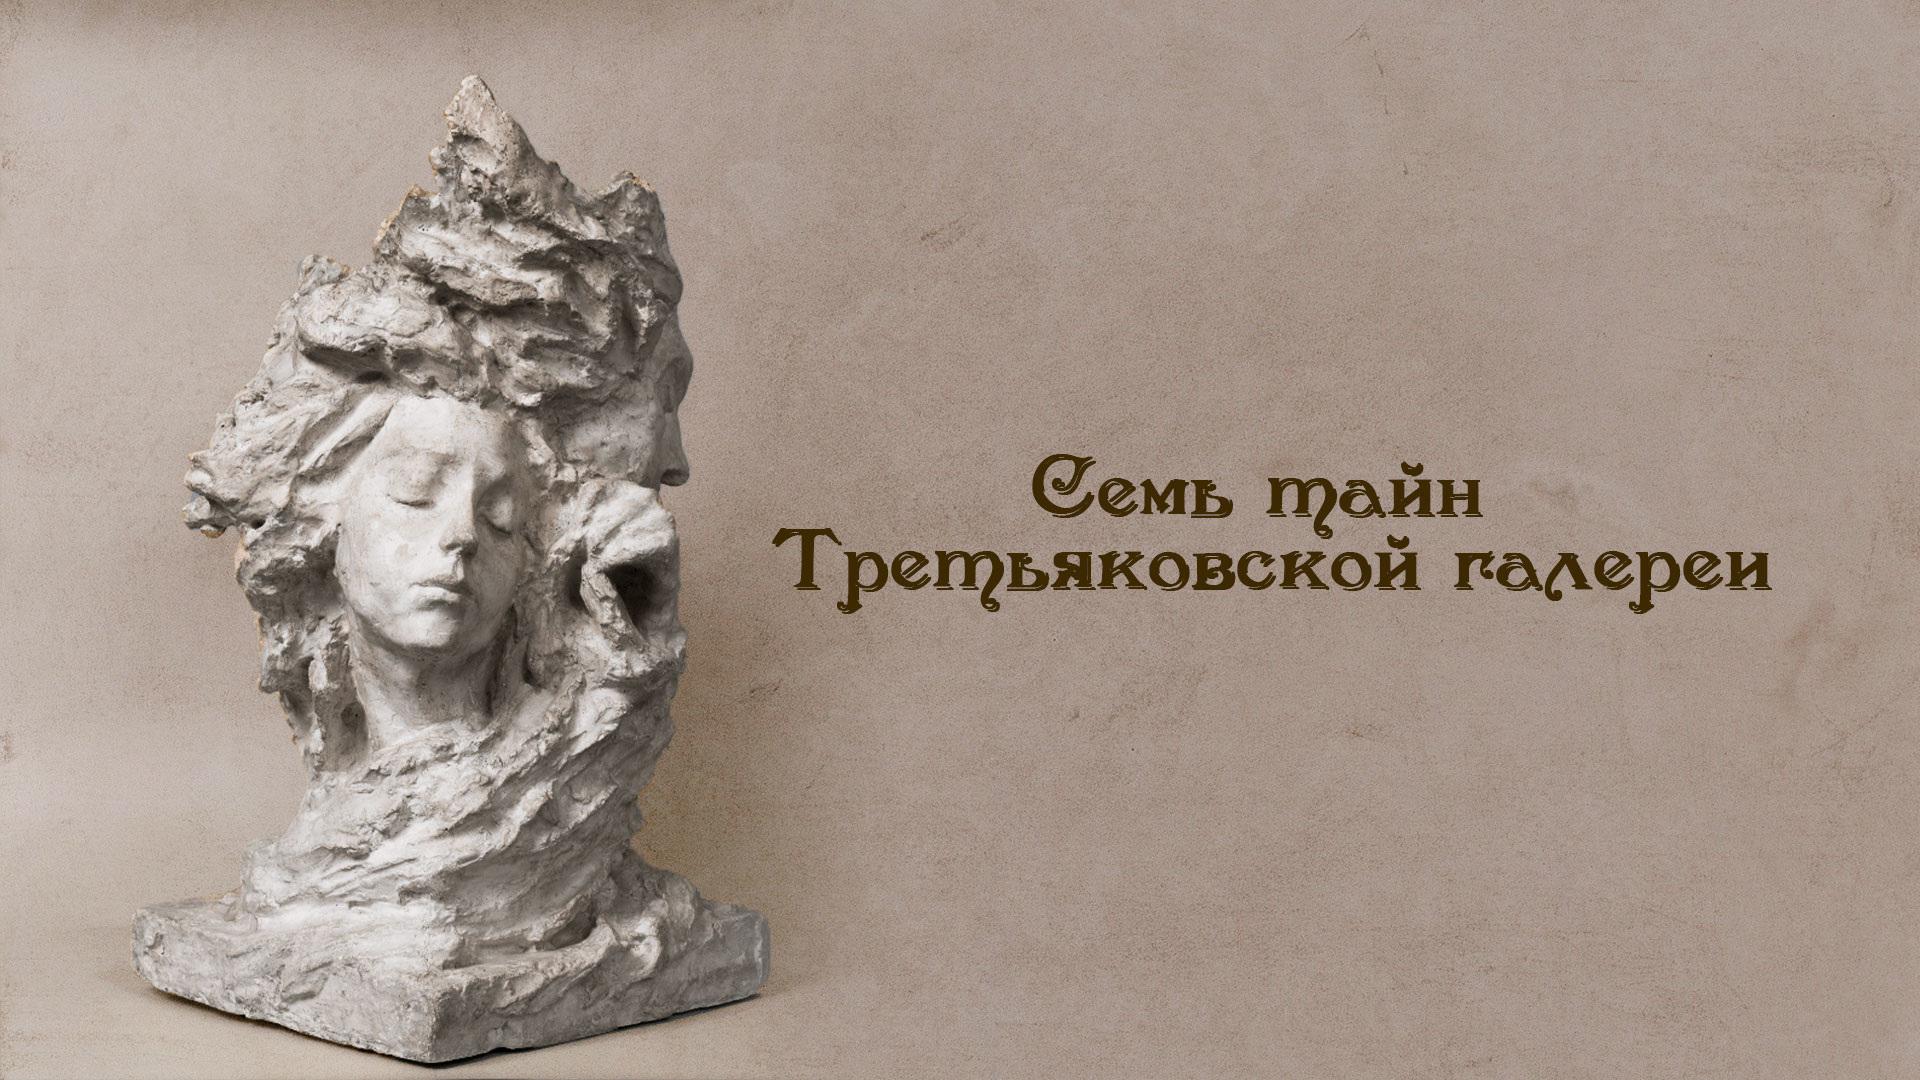 Семь тайн Третьяковской галереи